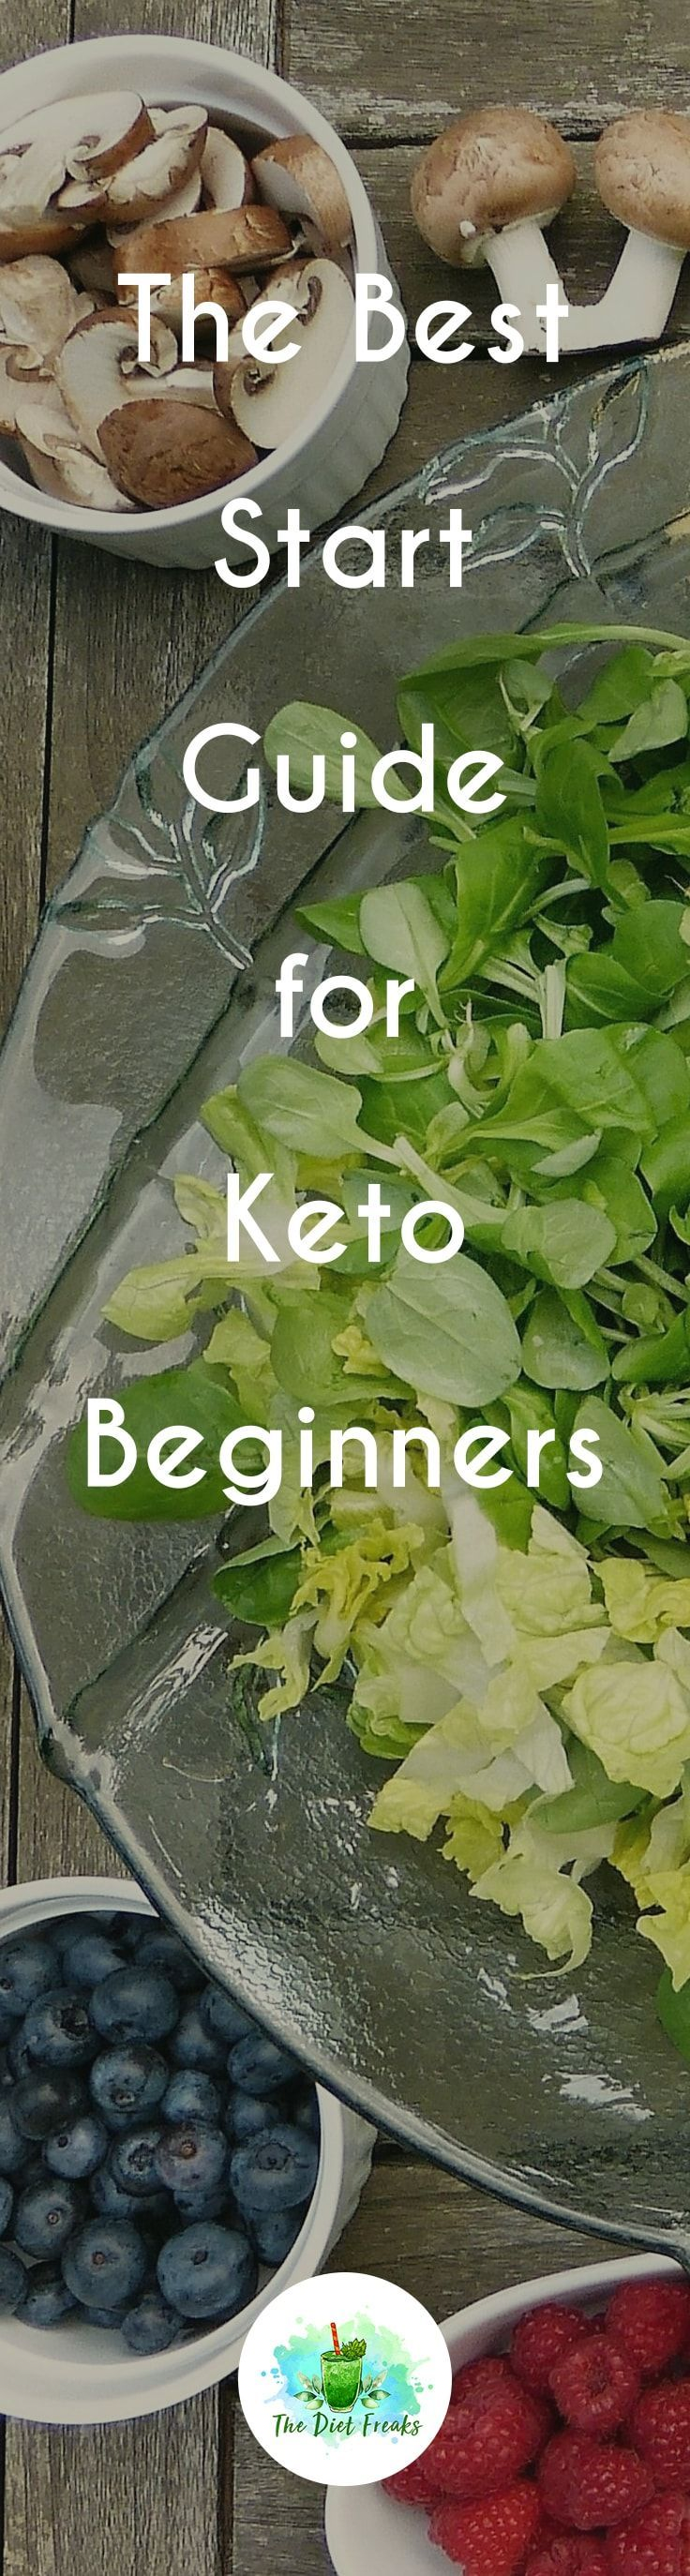 The Best Keto Start Guide (scheduled via http://www.tailwindapp.com?utm_source=pinterest&utm_medium=twpin)